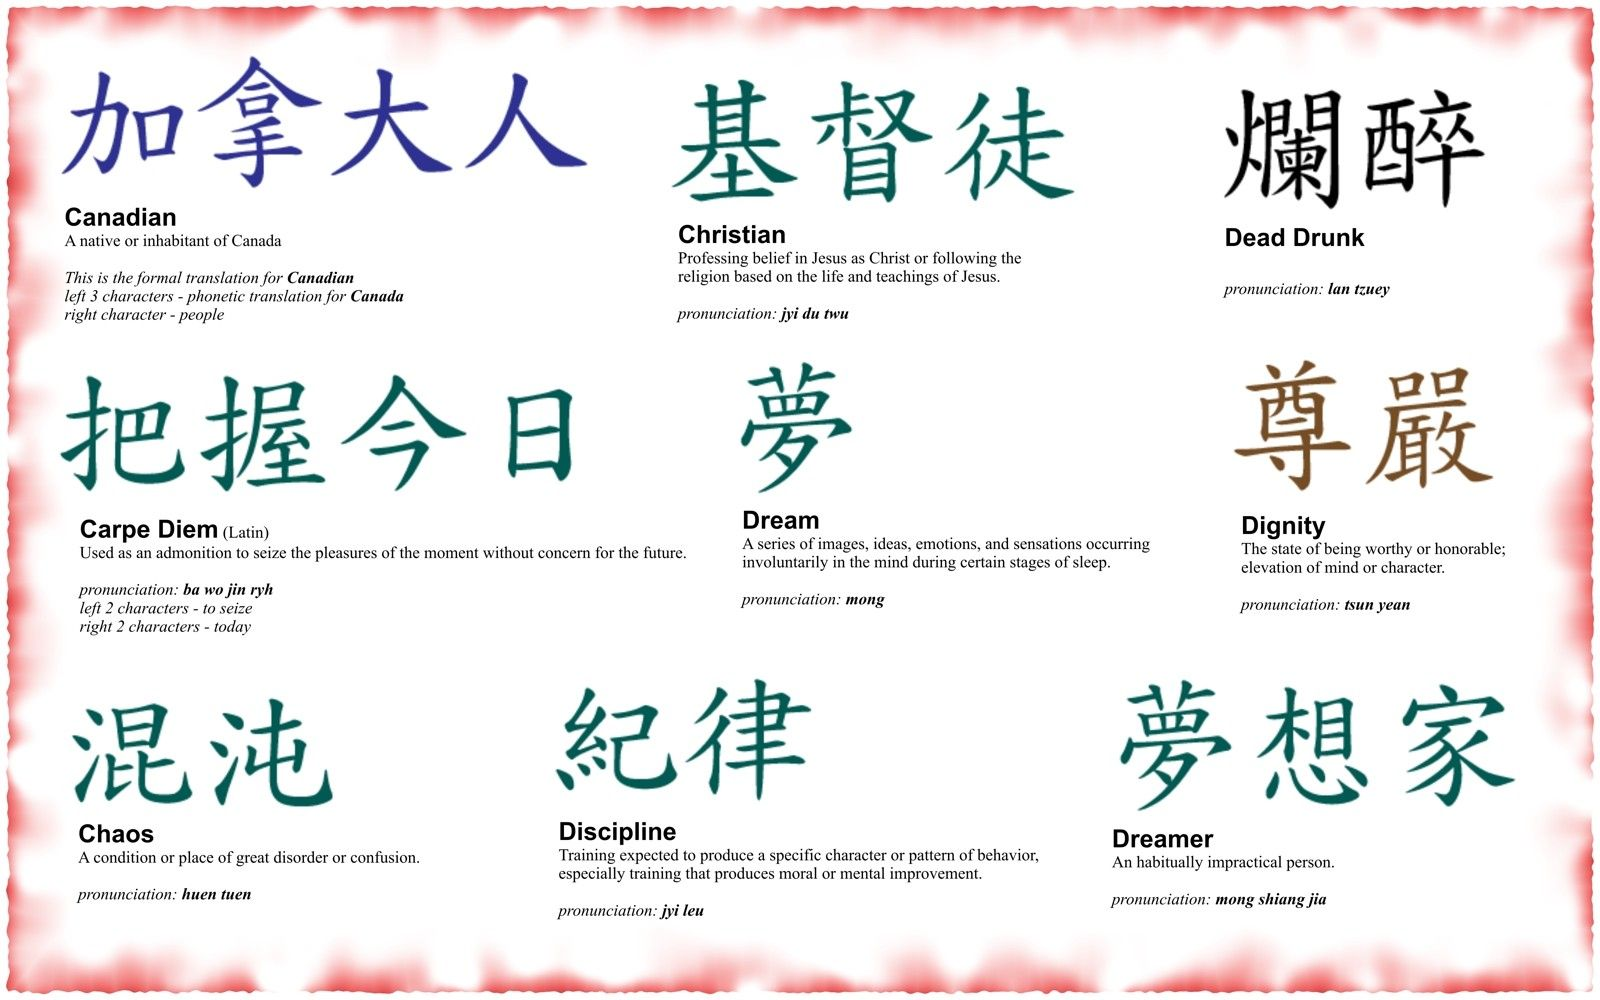 Epingle Par Cici Sur Words And Symbols 4 Tattoo